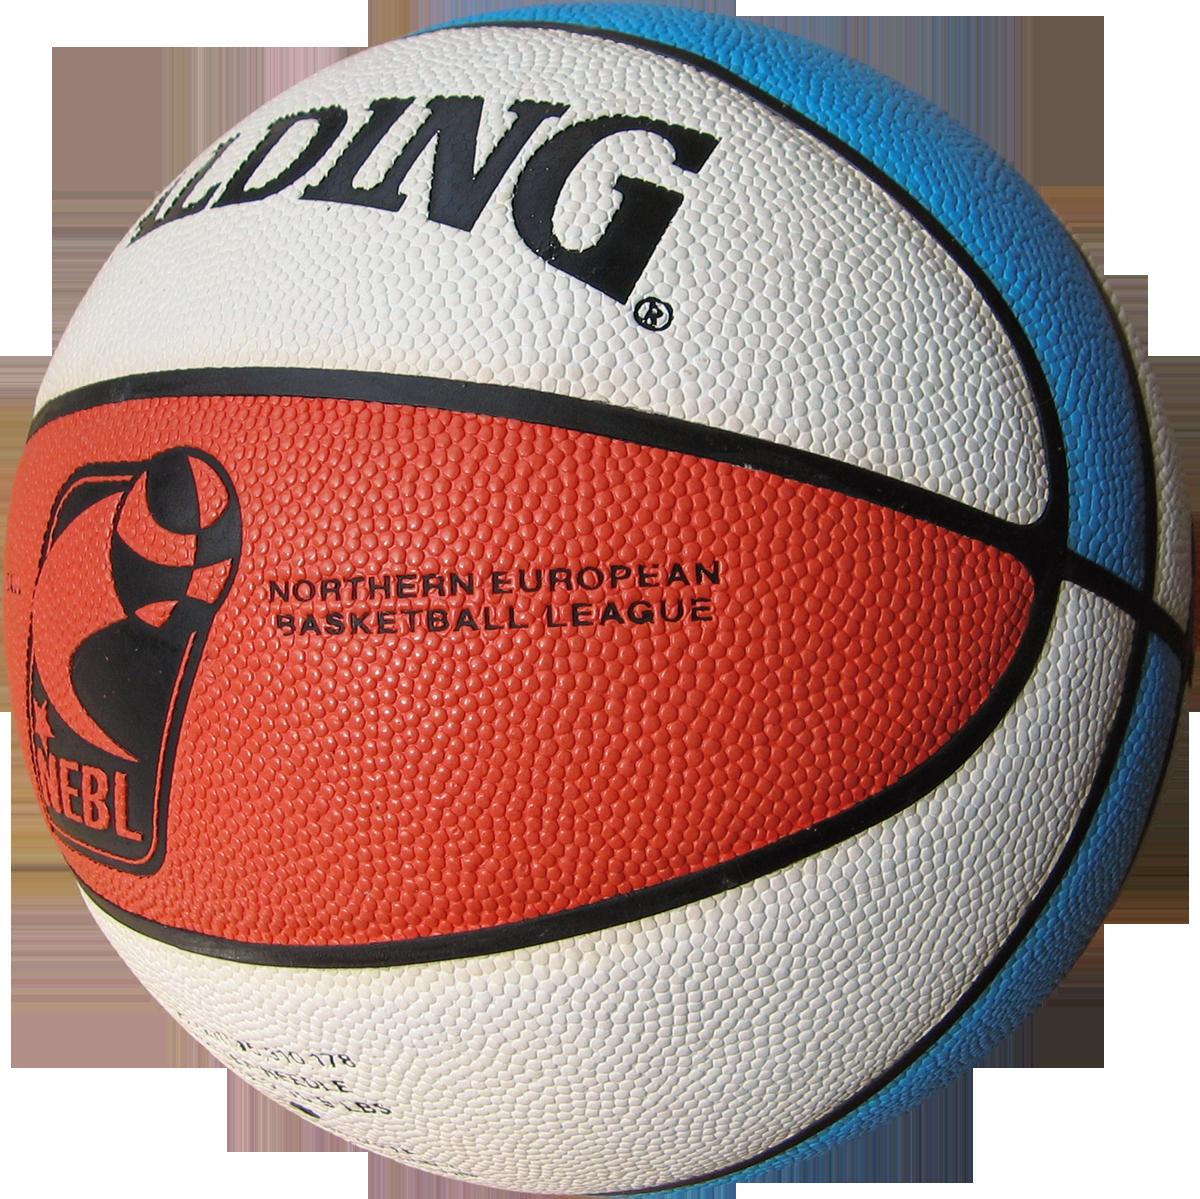 Spalding Basketball Balls  ed1f6f1771